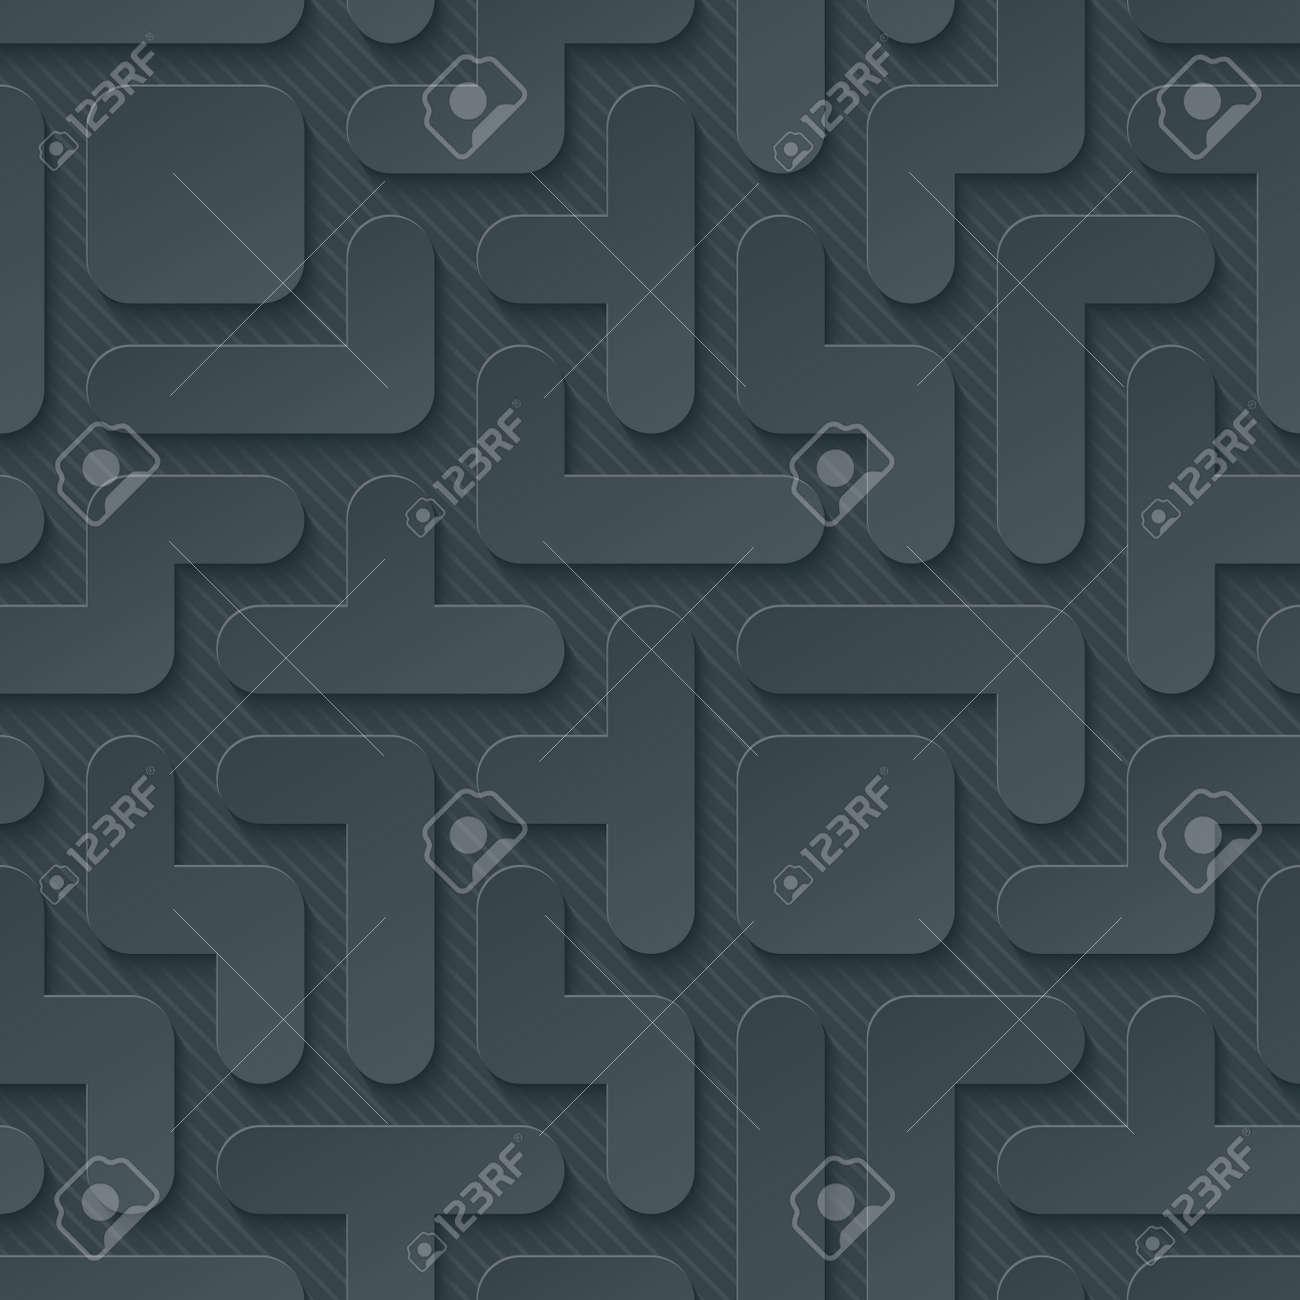 Tetris Wallpaper 3d Seamless Background Vector Eps10 Royalty Free